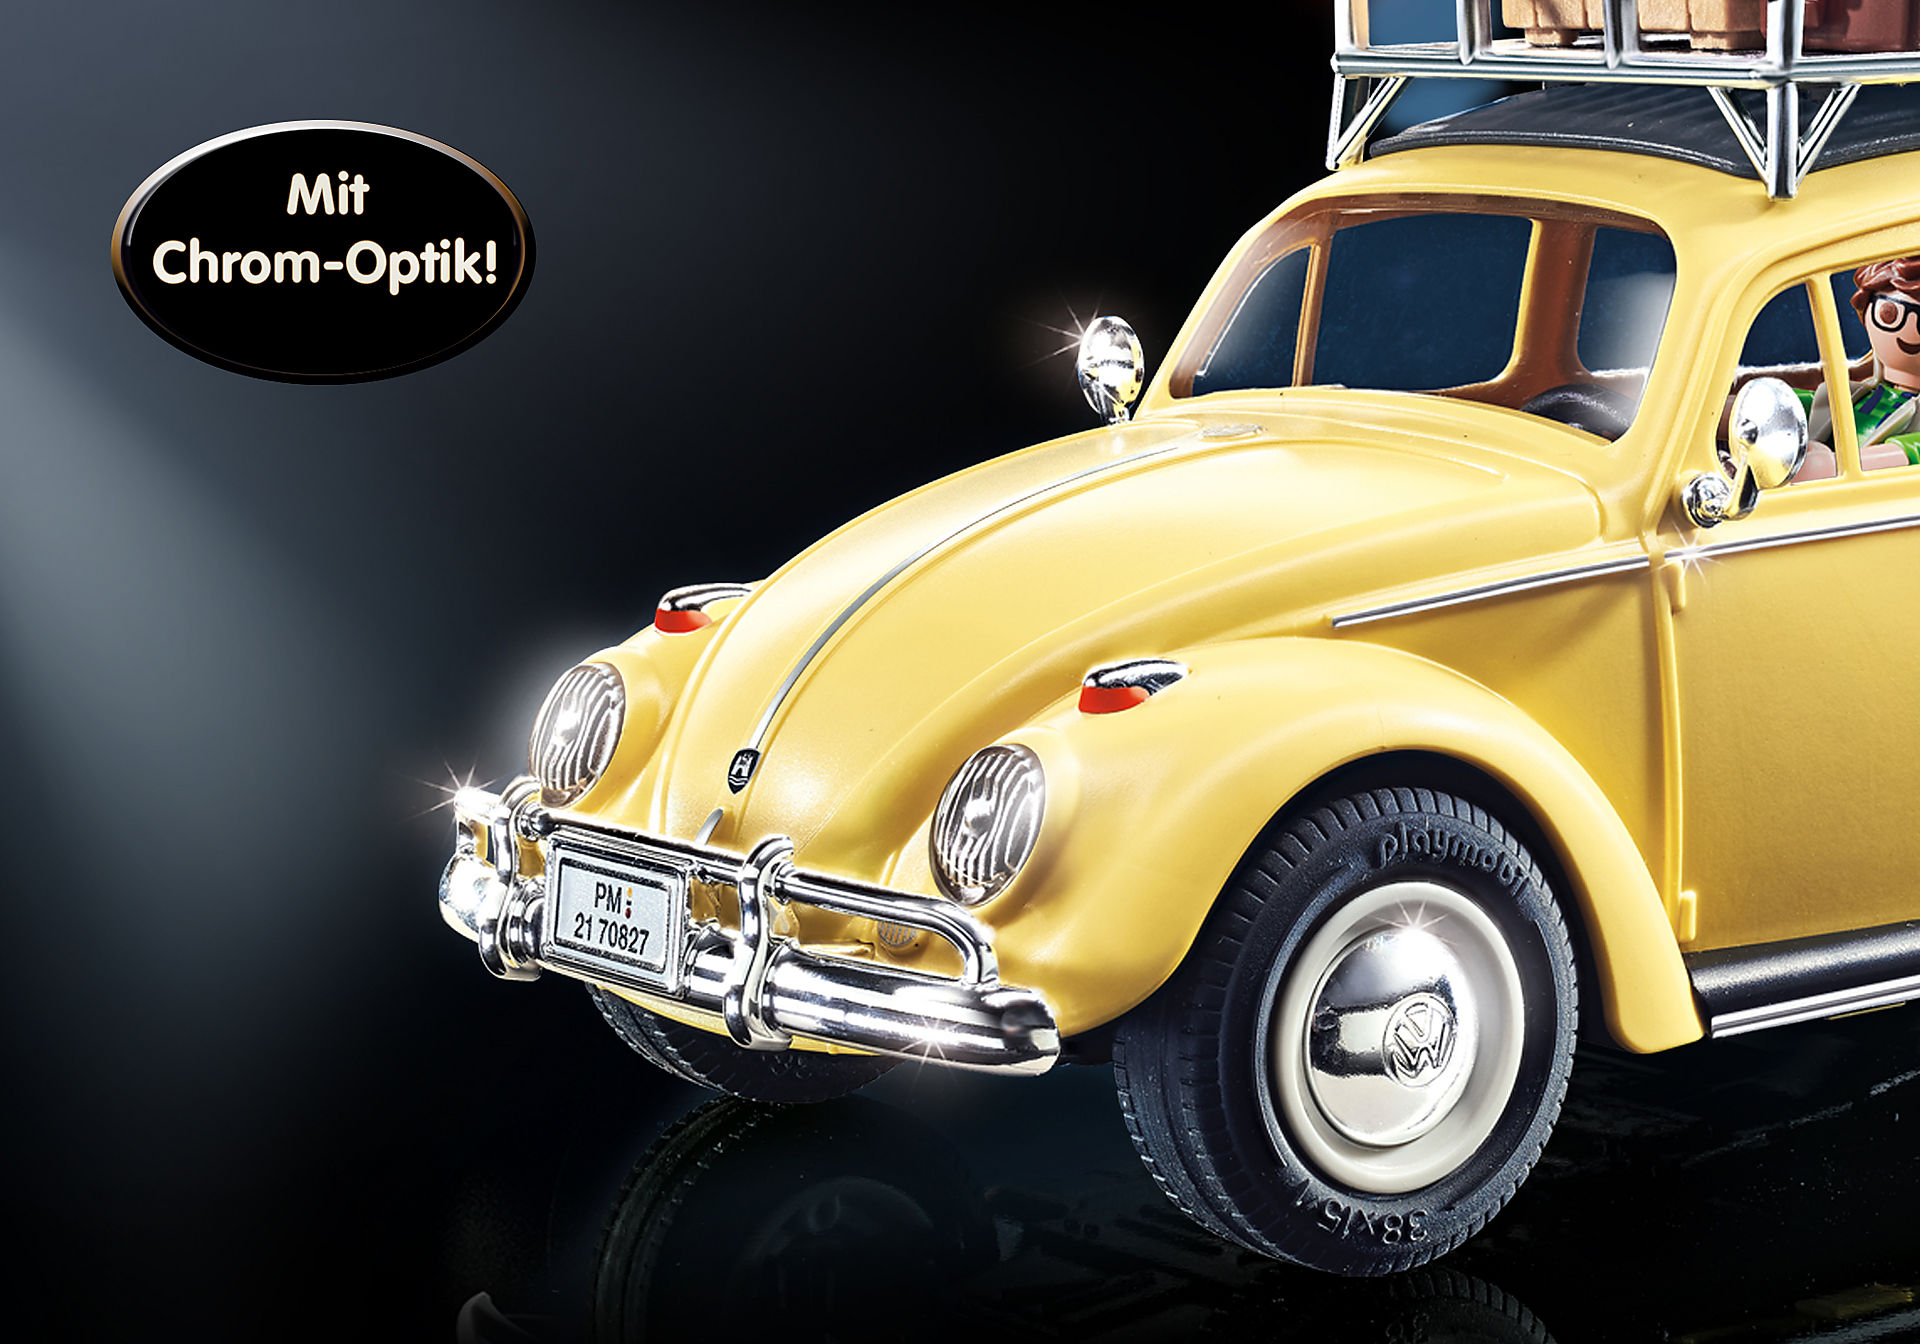 70827 Volkswagen Beetle - Edição especial zoom image4